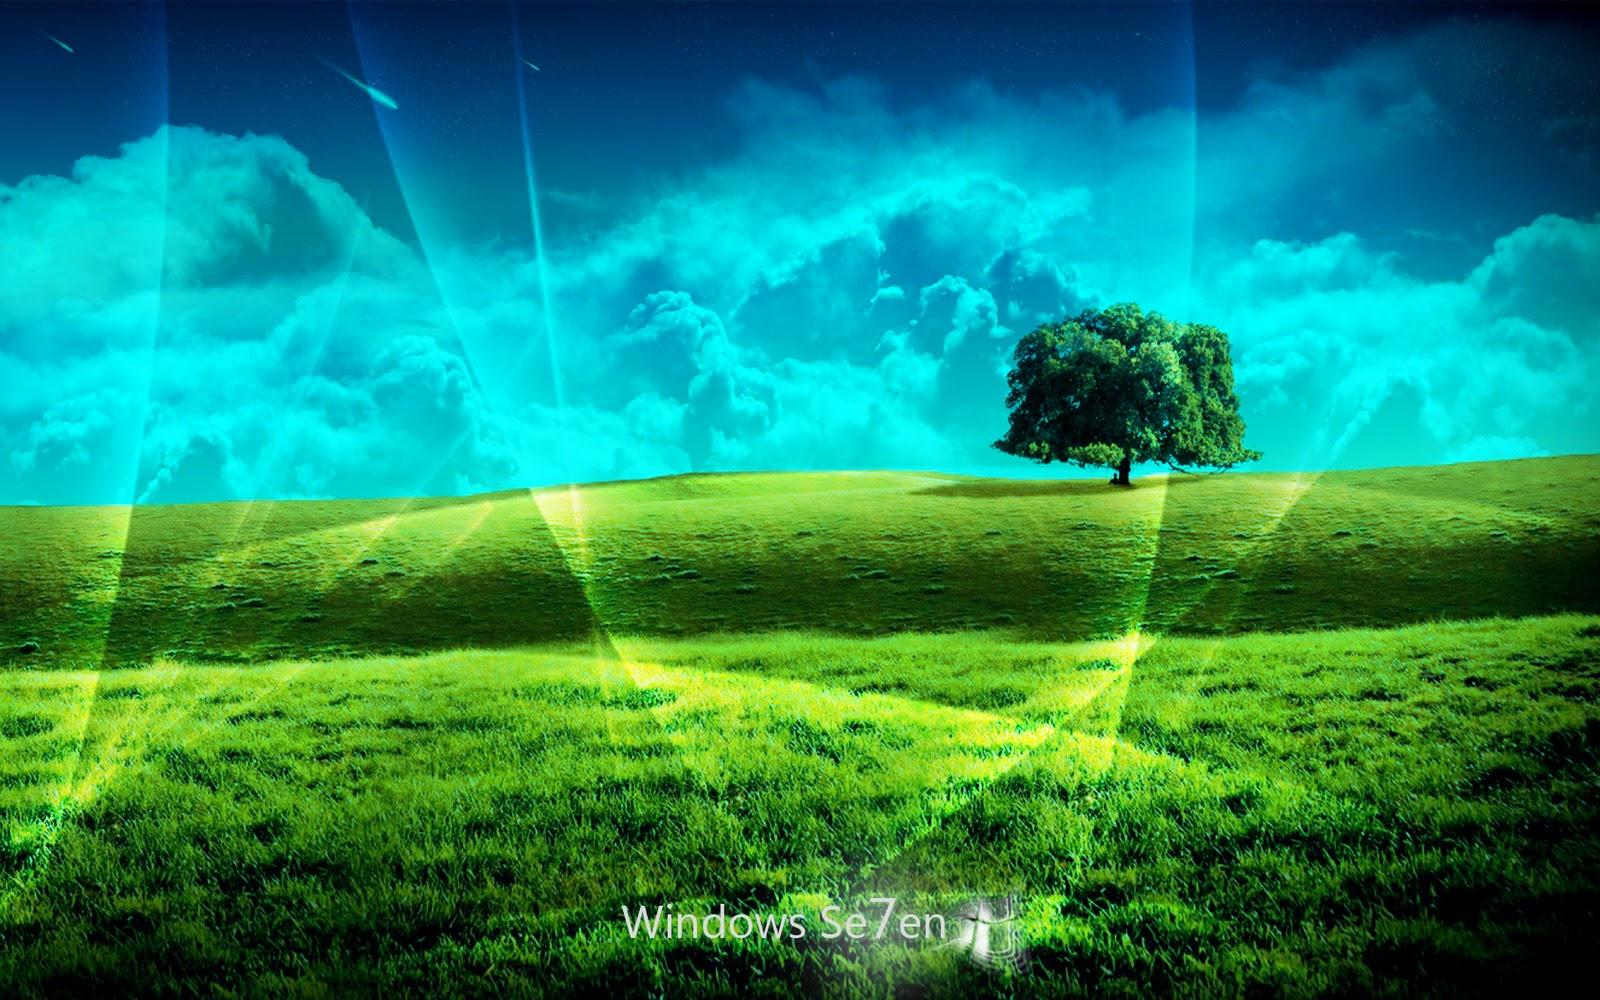 animated desktop wallpaper for windows 7 - faw